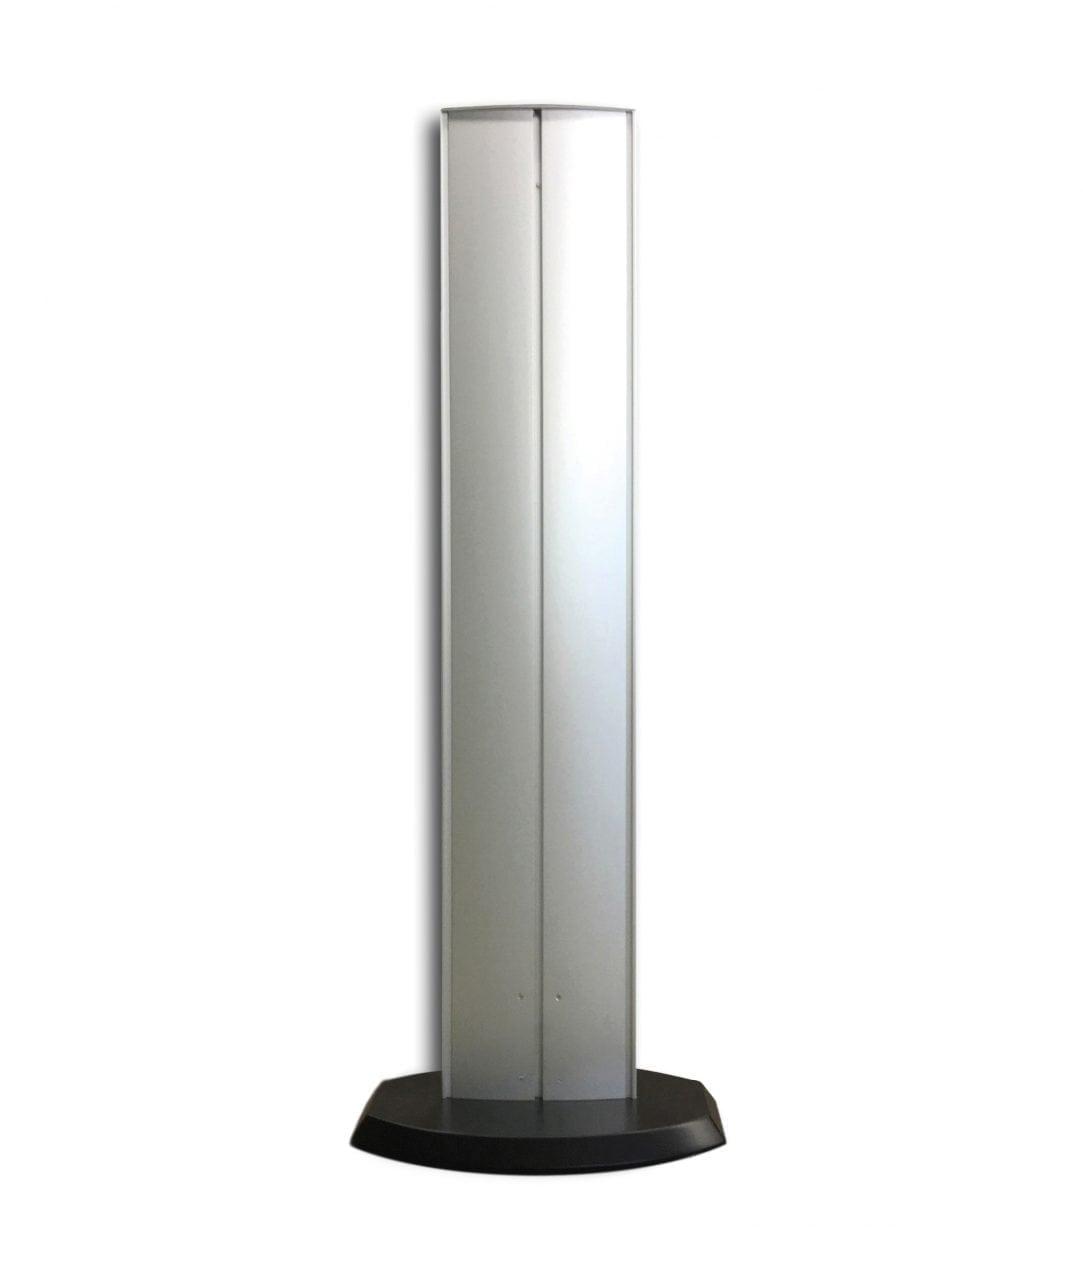 Konvex pylonskylt, inomhus – CONVEXA (CN759)